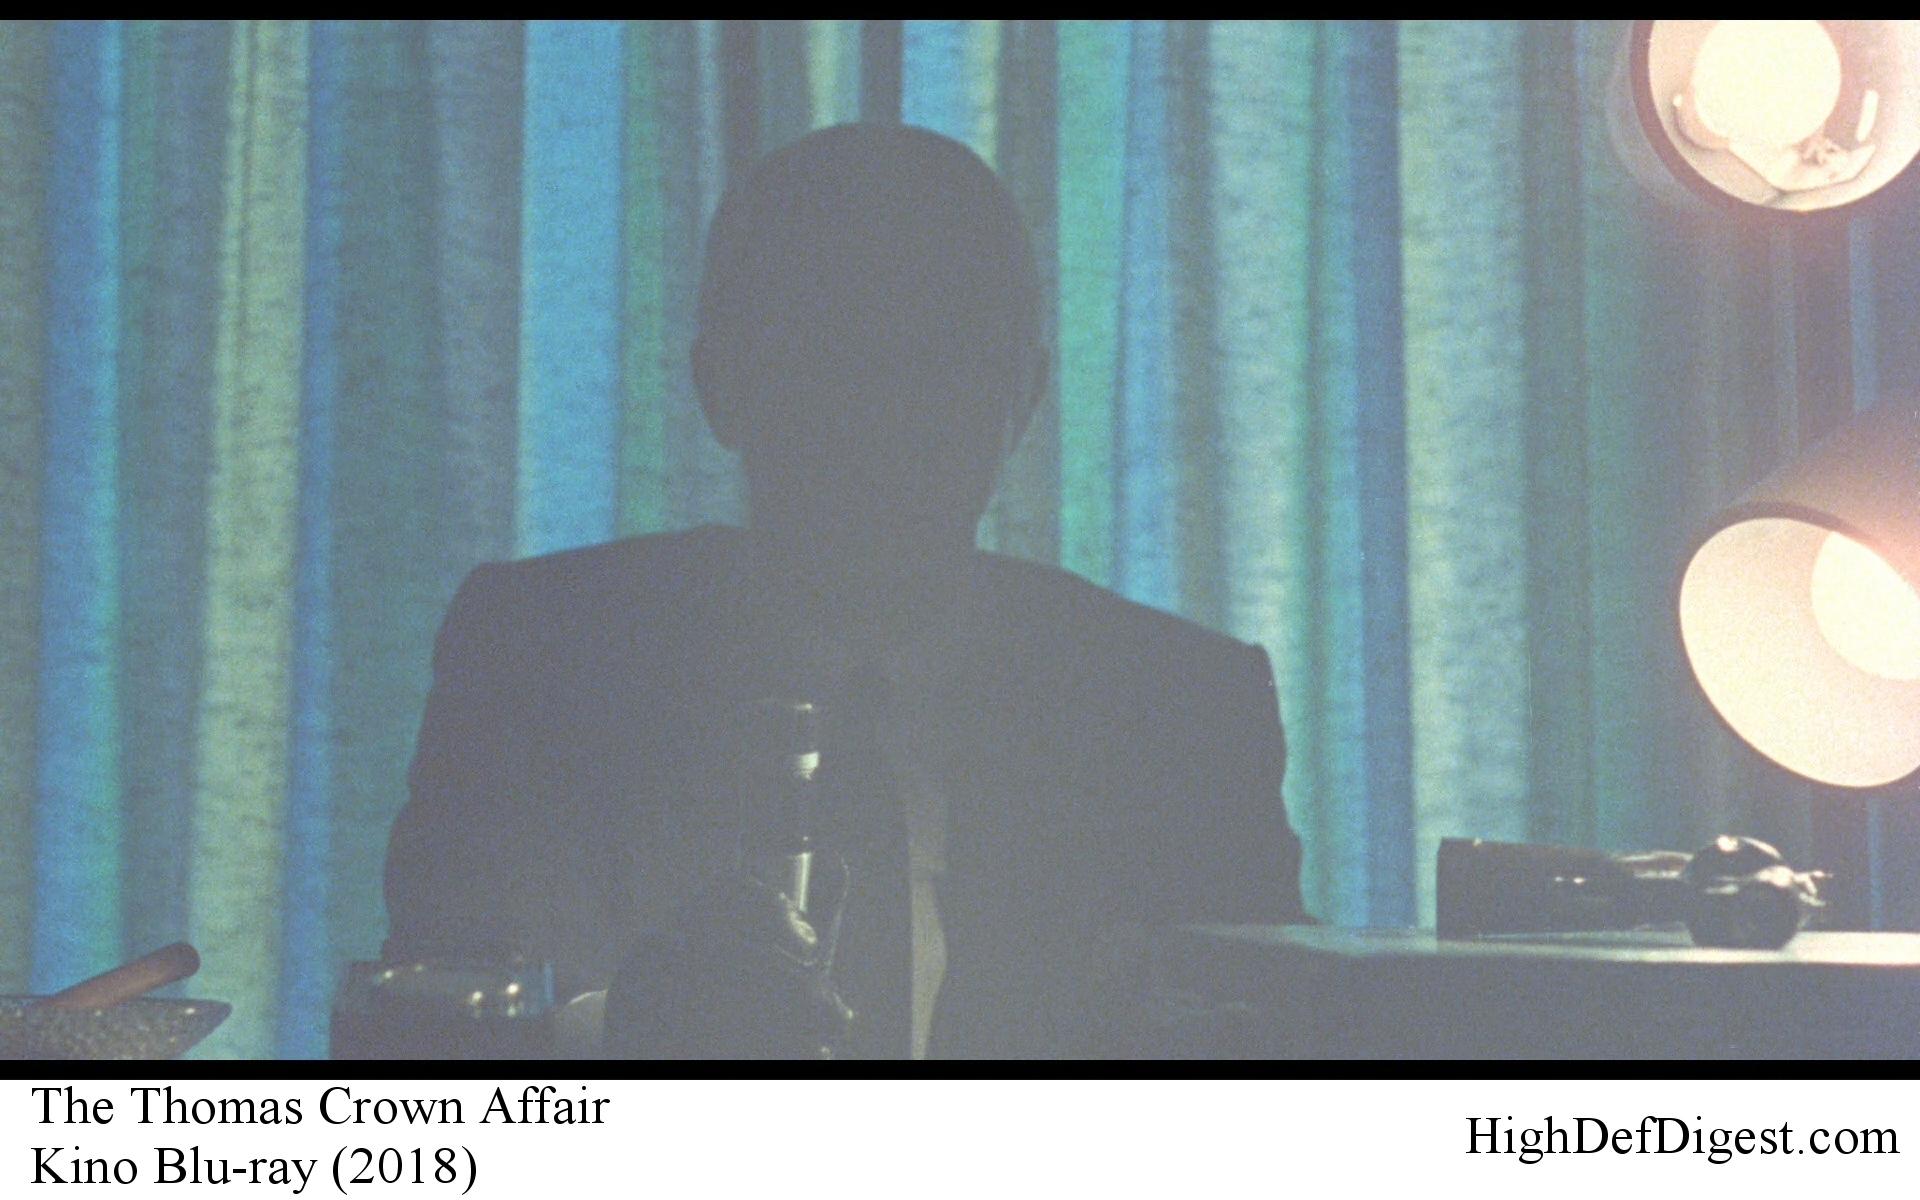 The Thomas Crown Affair - Steve McQueen in Silhouette Comparison Kino